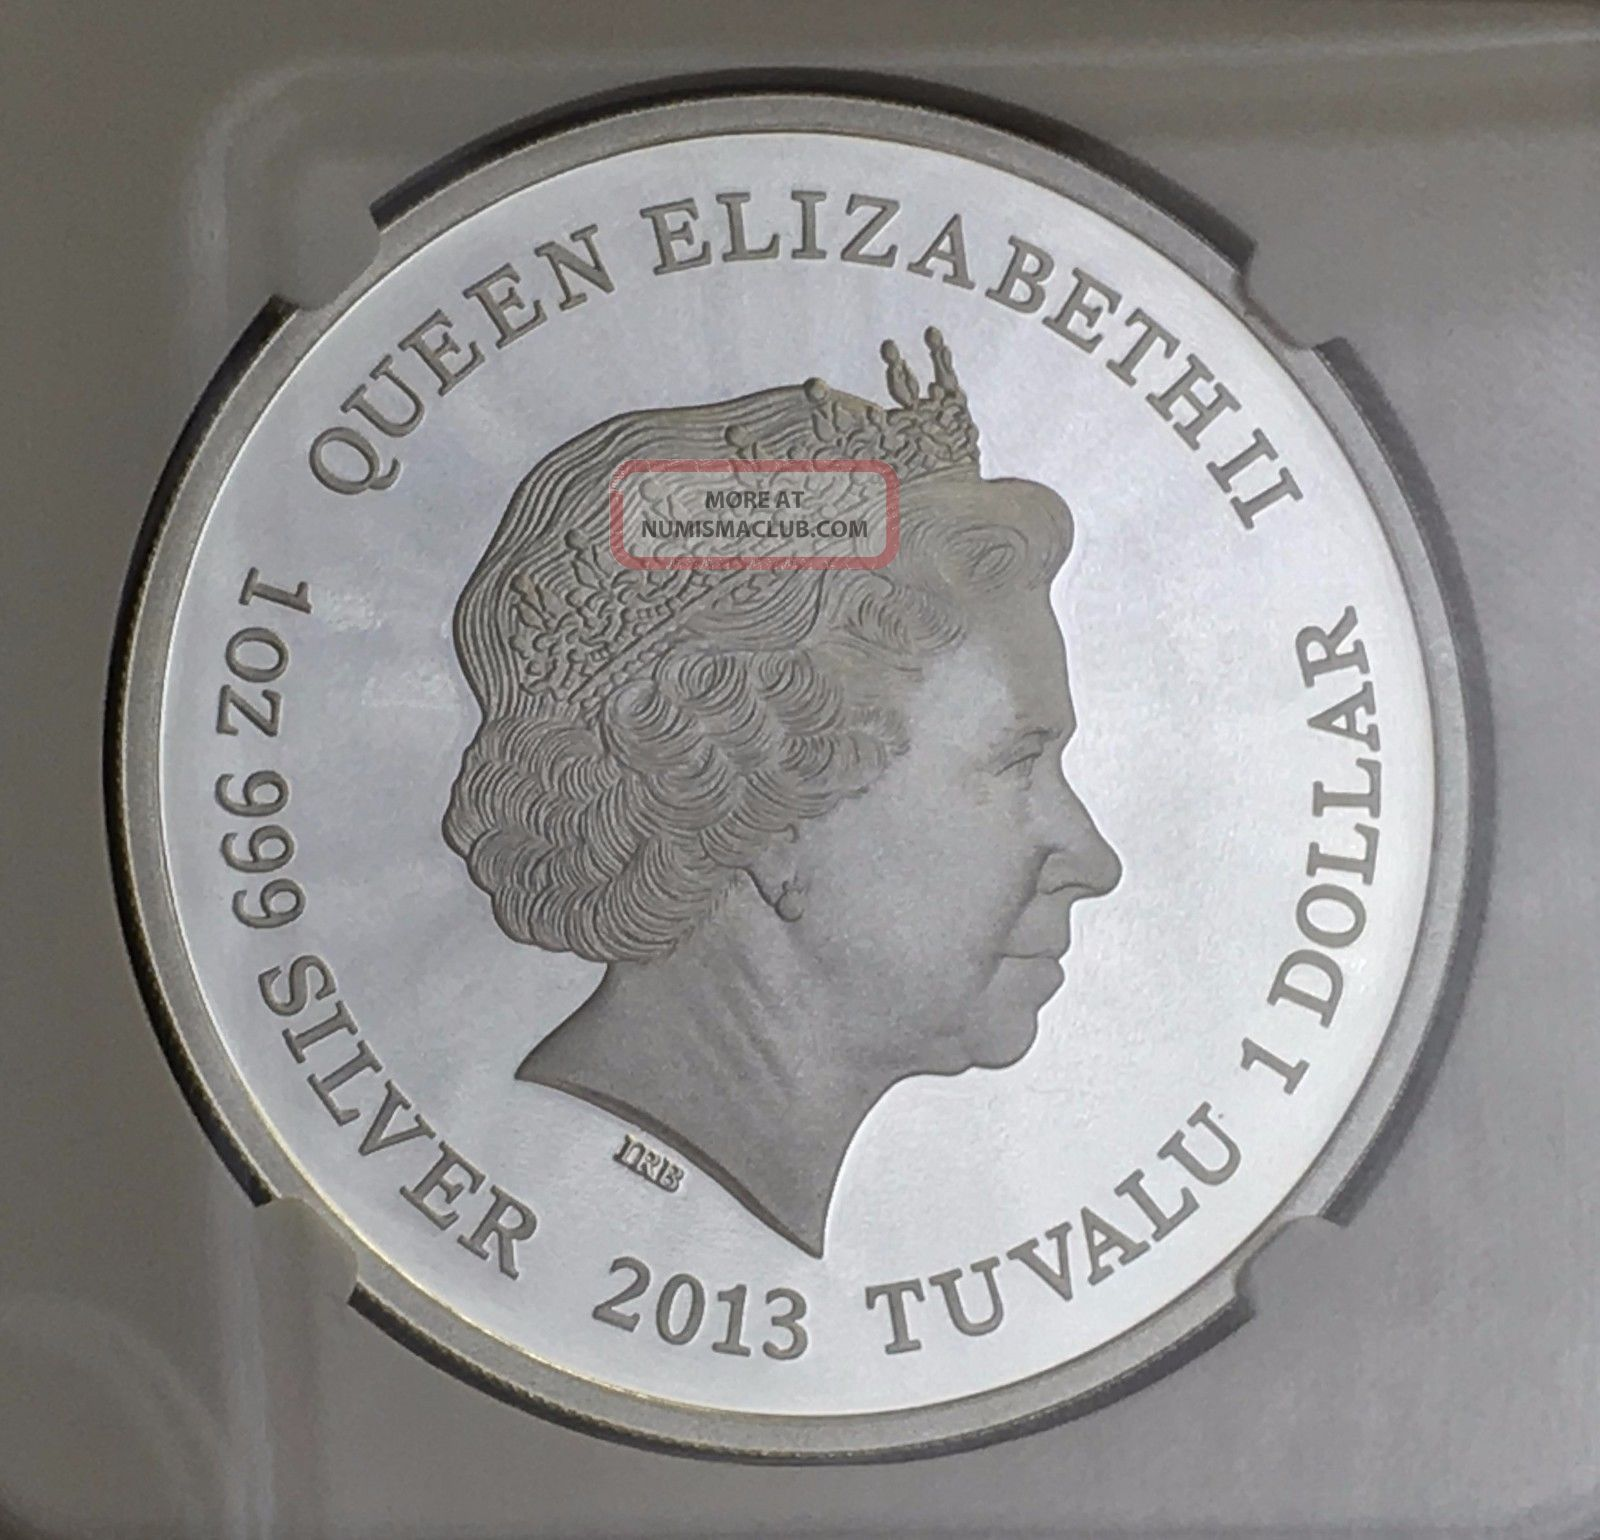 2013 Tuvalu Tasmanian Devil Silver Coin Very Rare Ngc Pf70